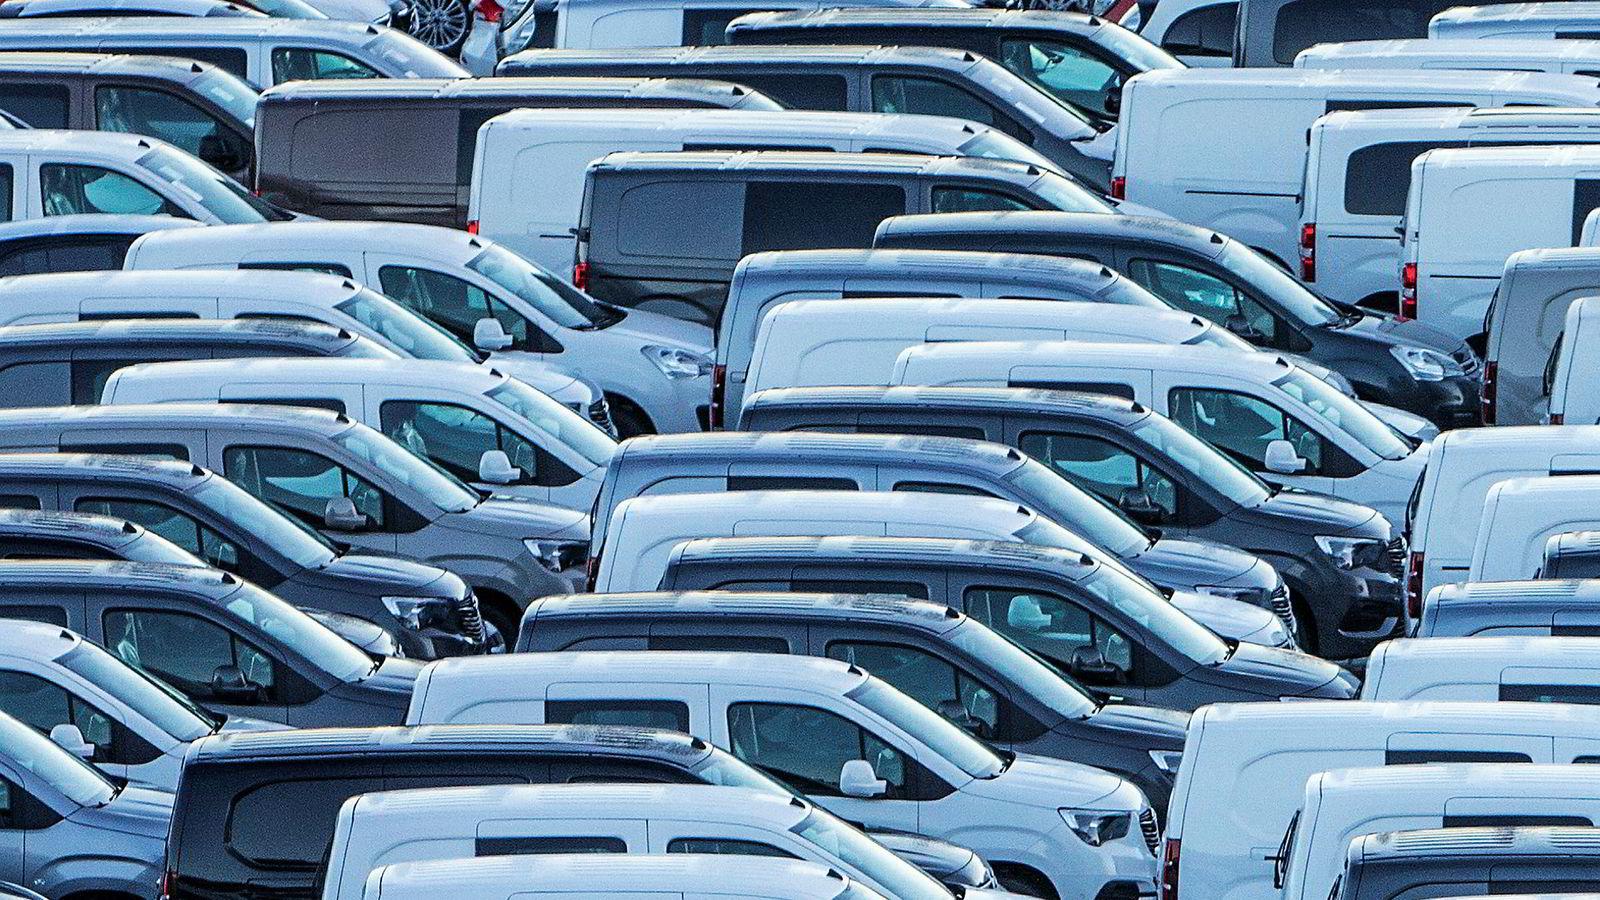 Nye varebiler parkert ved Drammen Havn etter ankomst til landet.